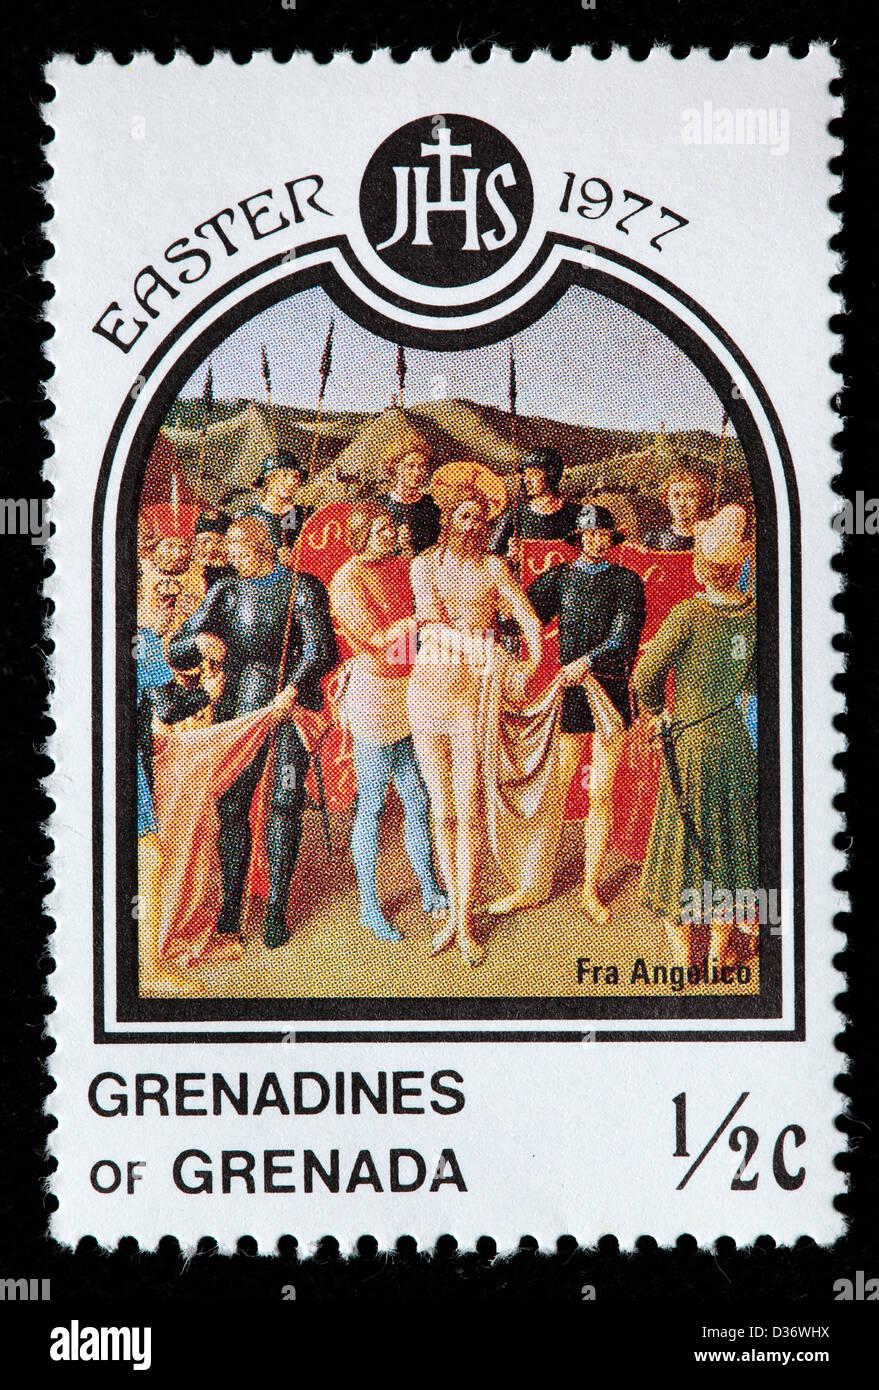 Fra Angelico, Easter, postage stamp, Grenada Grenadines, 1977 - Stock Image